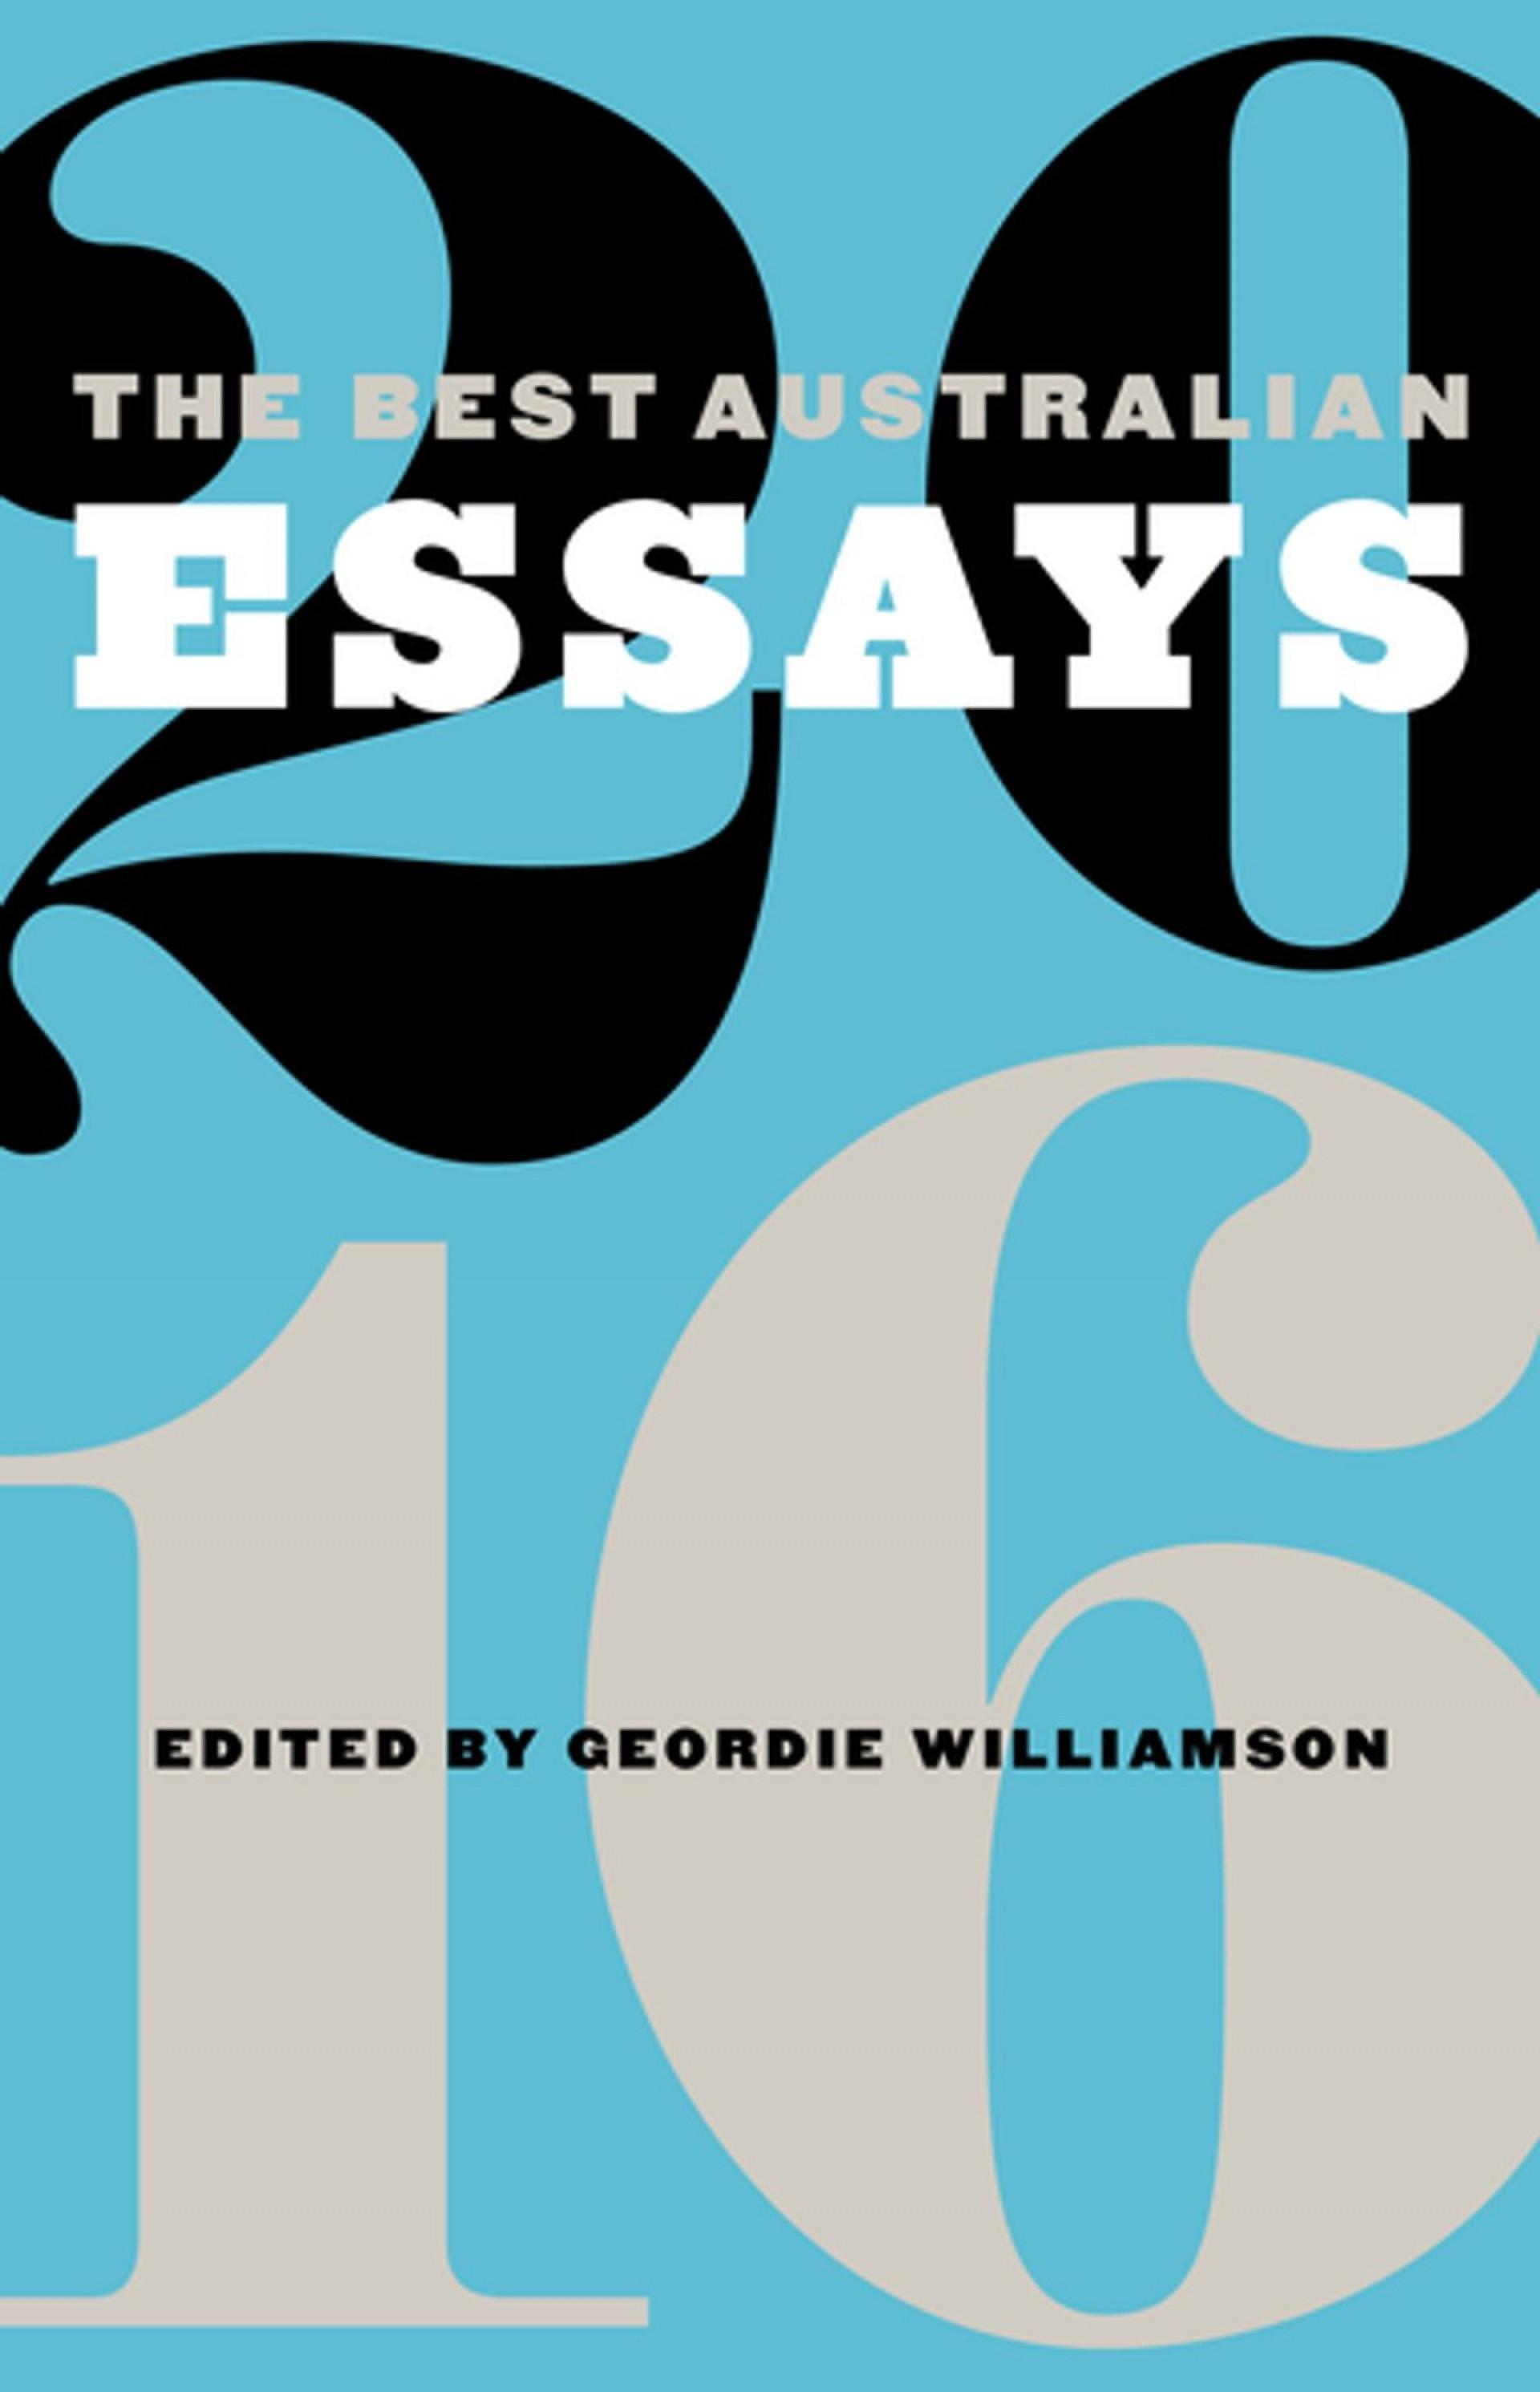 009 The Best Australian Essays Essay Breathtaking 2016 Personal College 1920